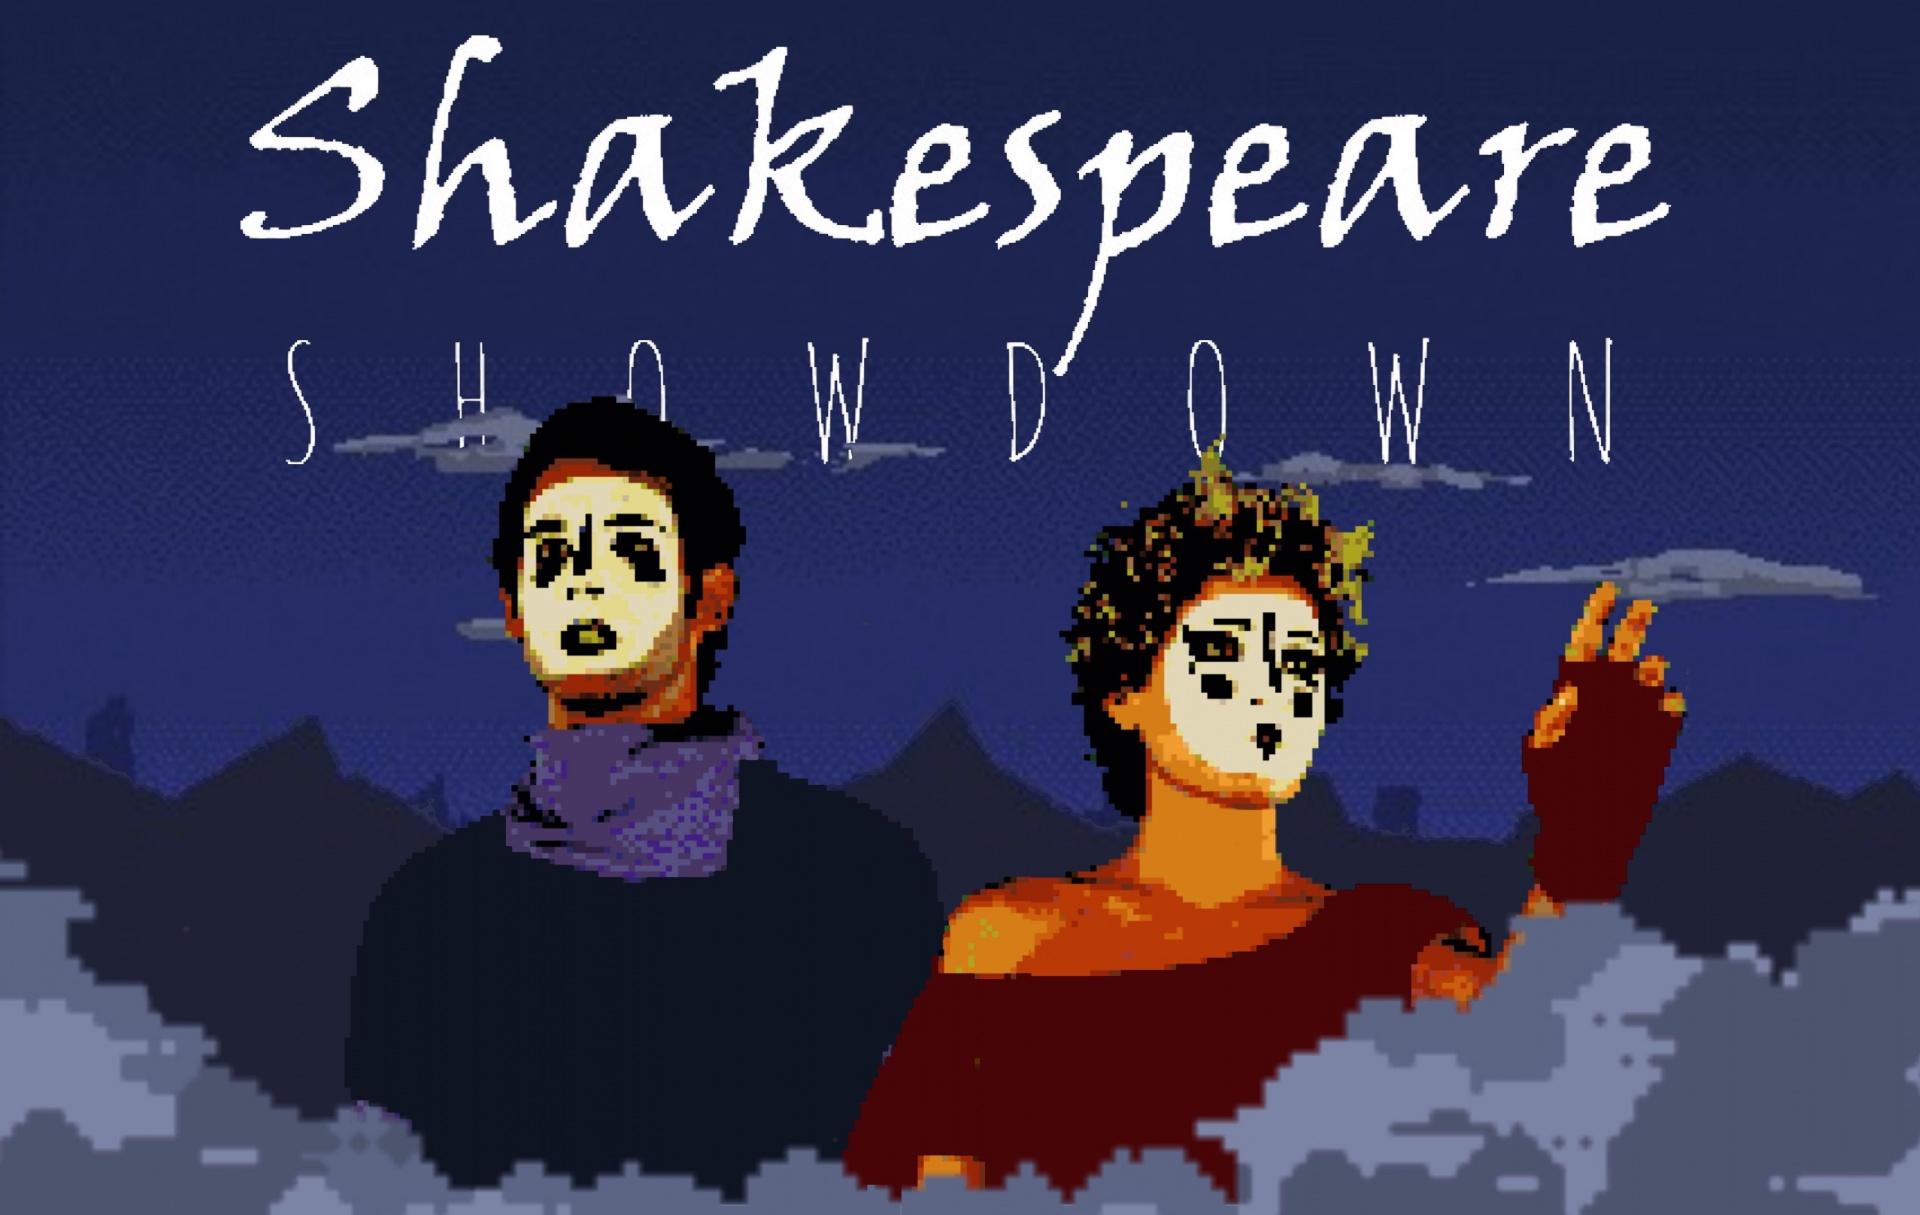 shakespeare showdown.jpg